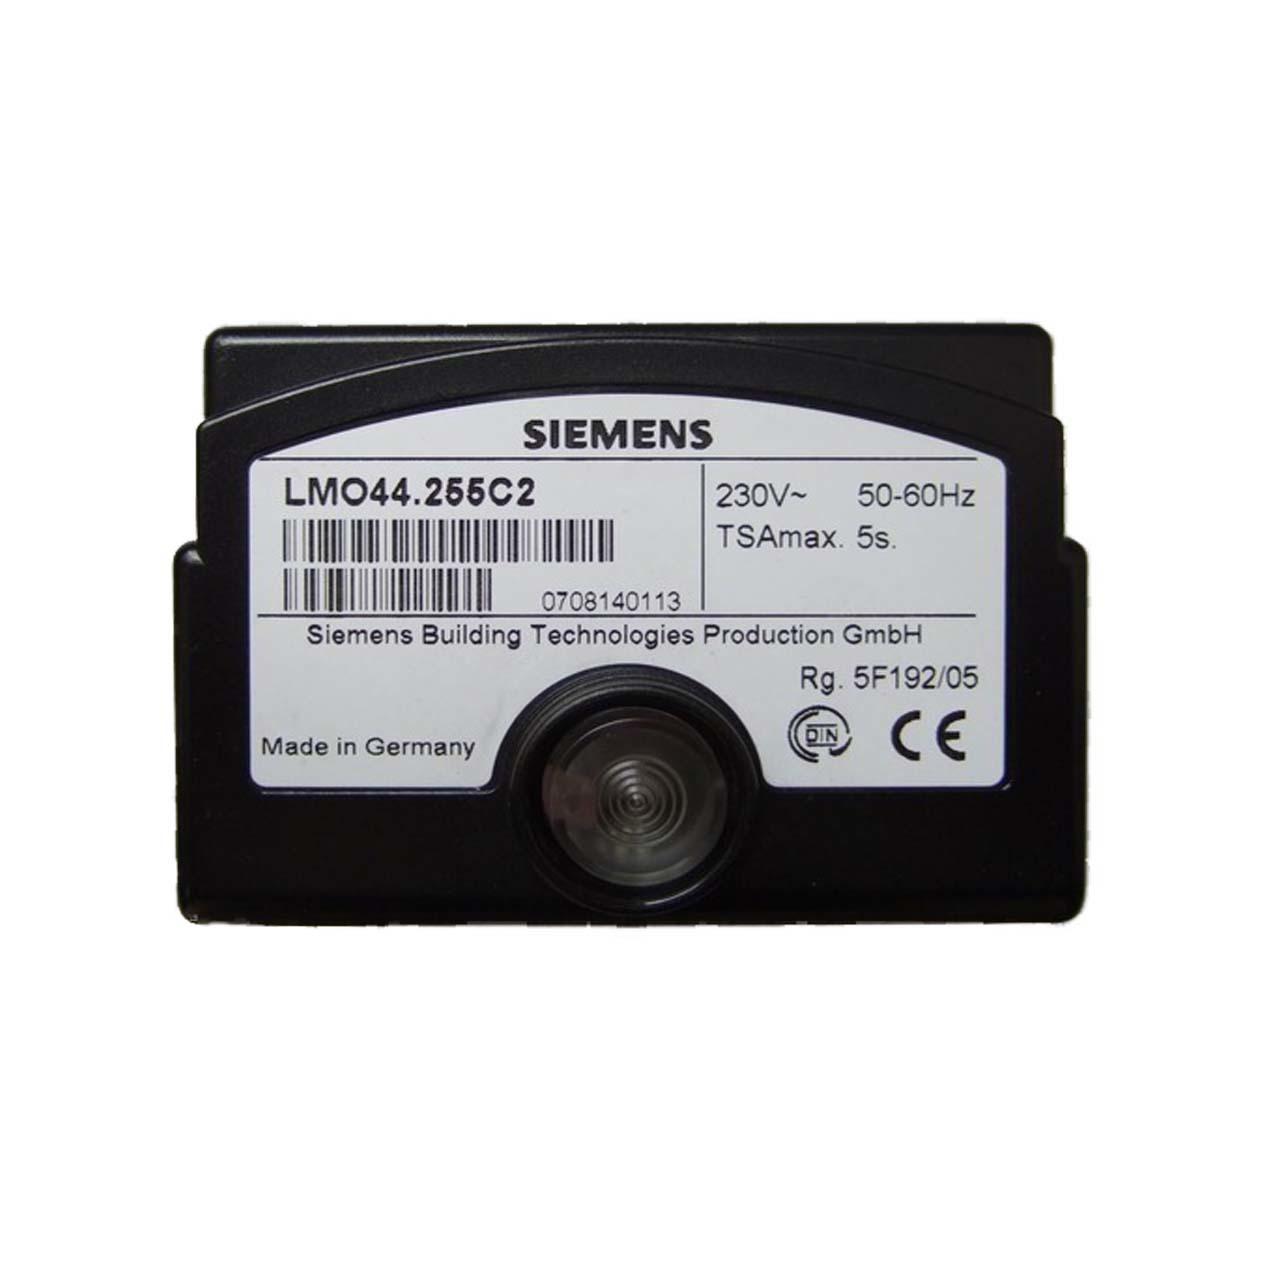 LMO44 Siemens Control Box